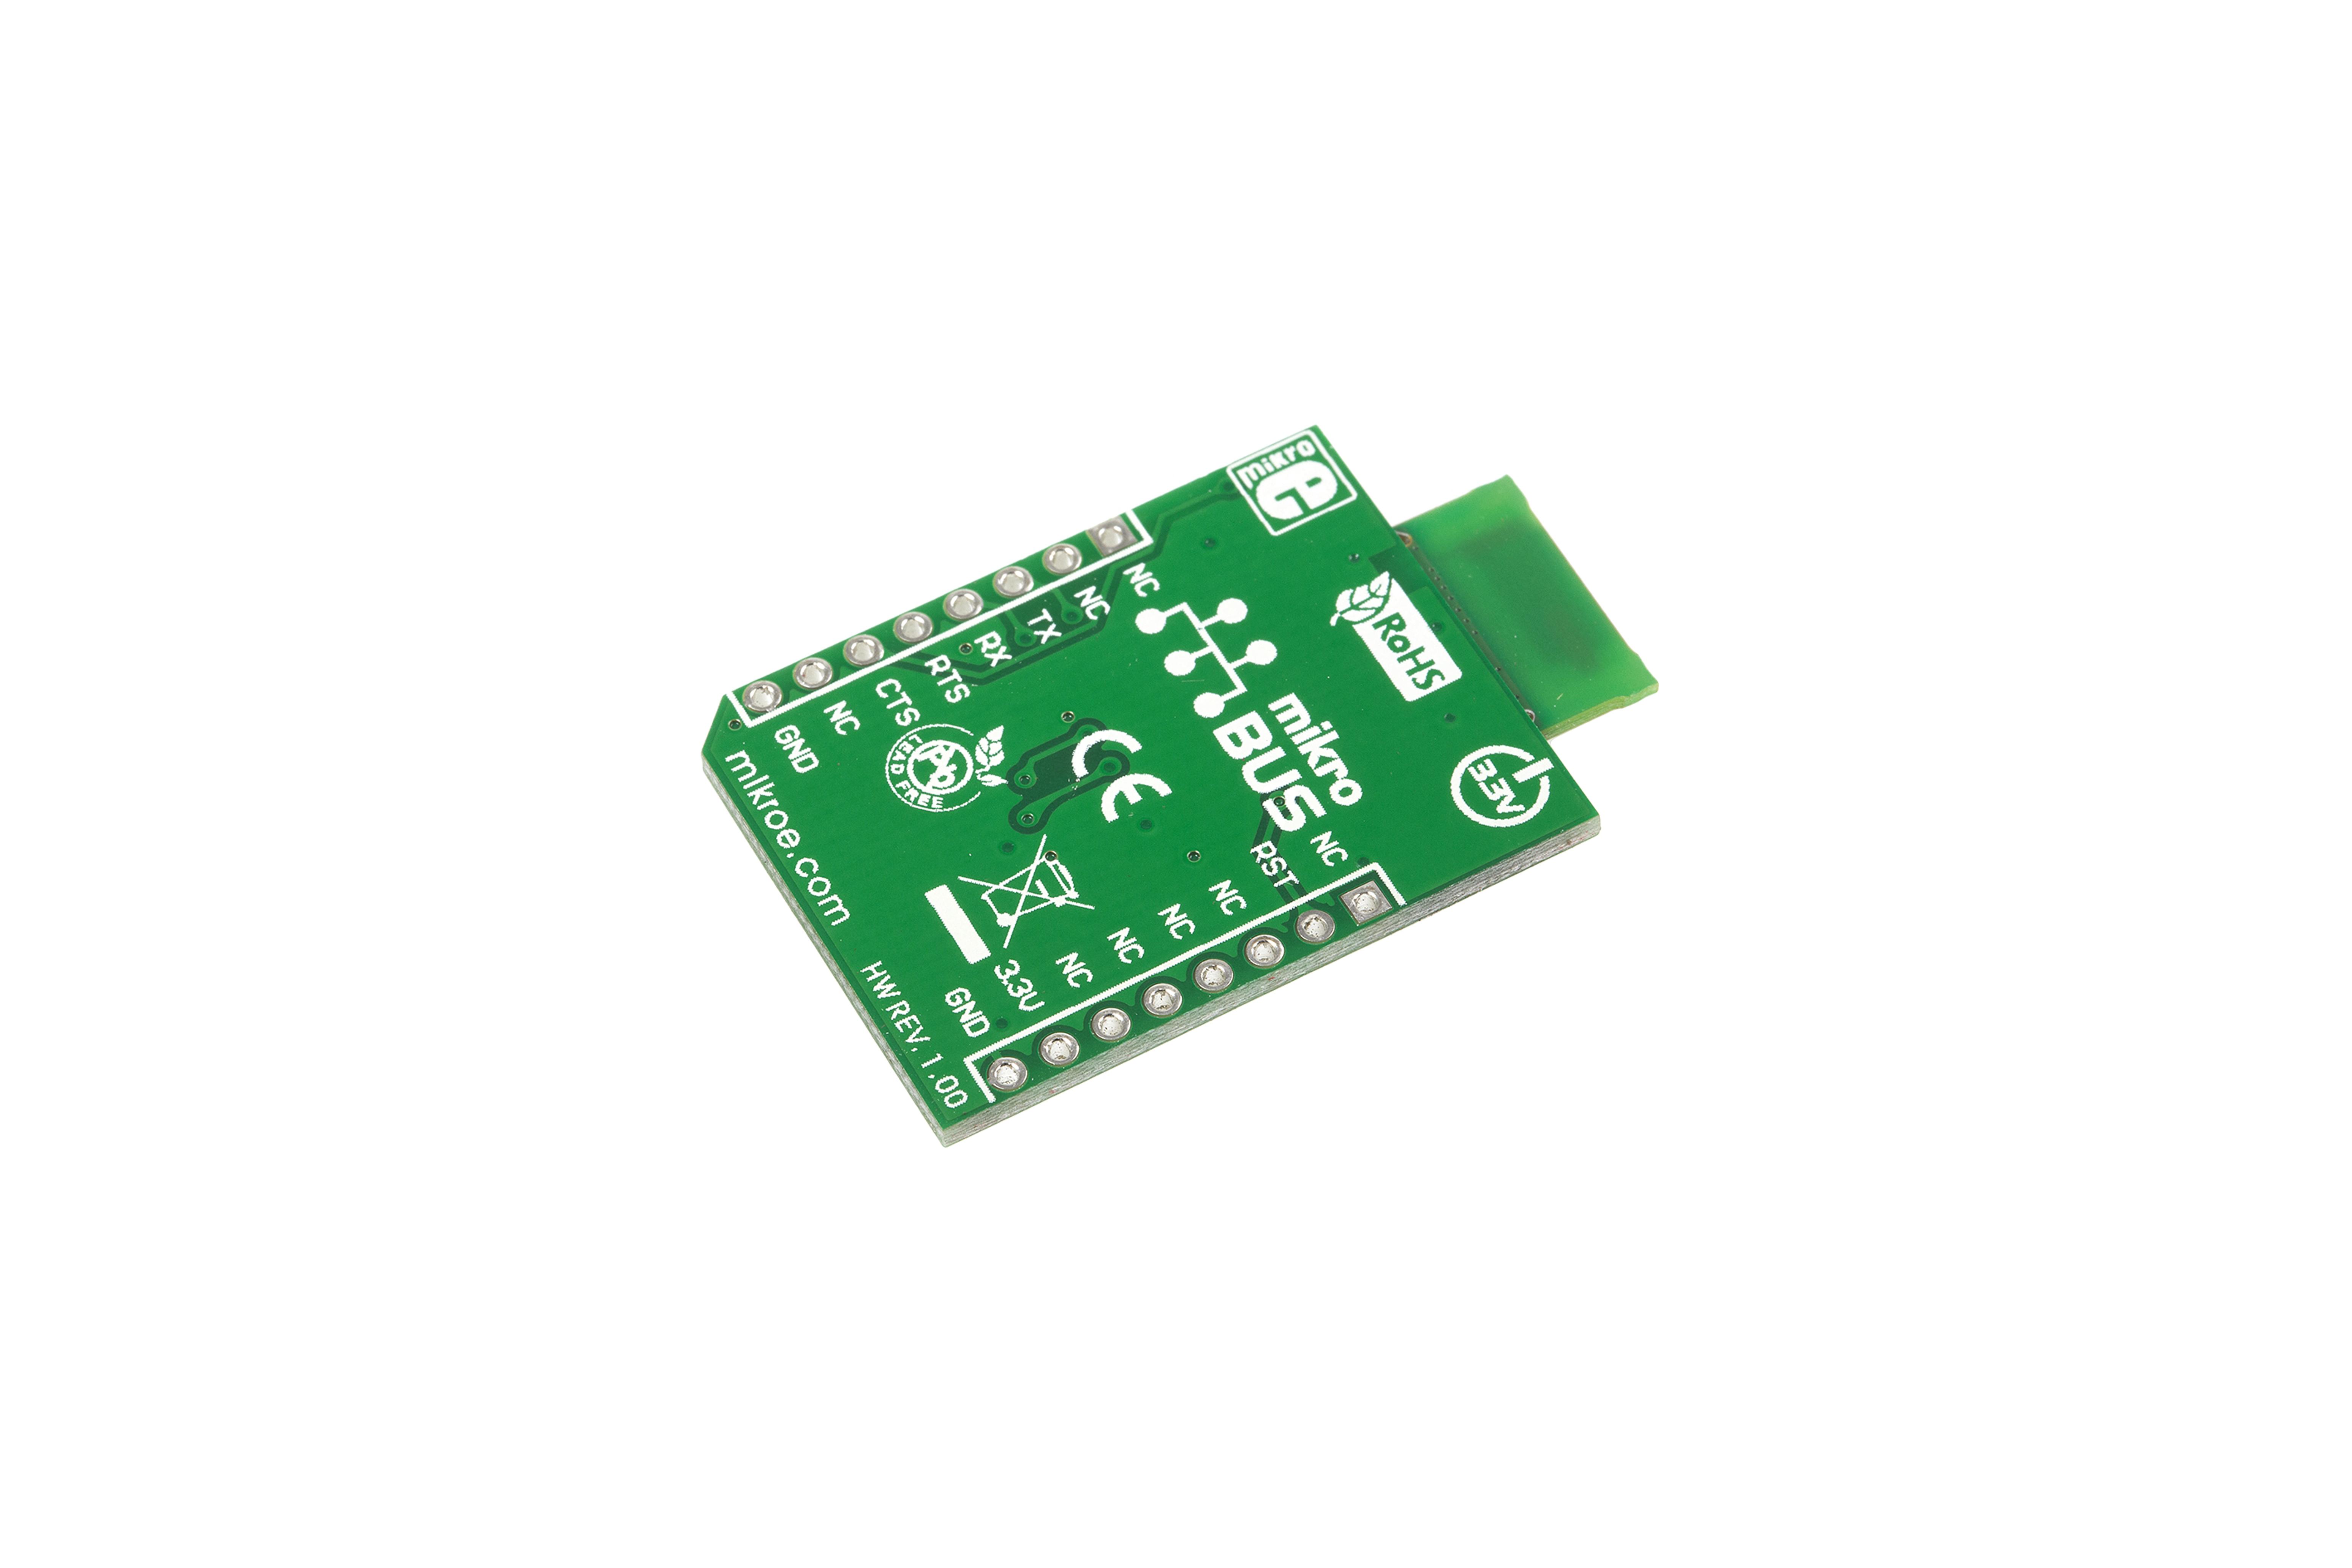 Bluetooth click mikroBUS